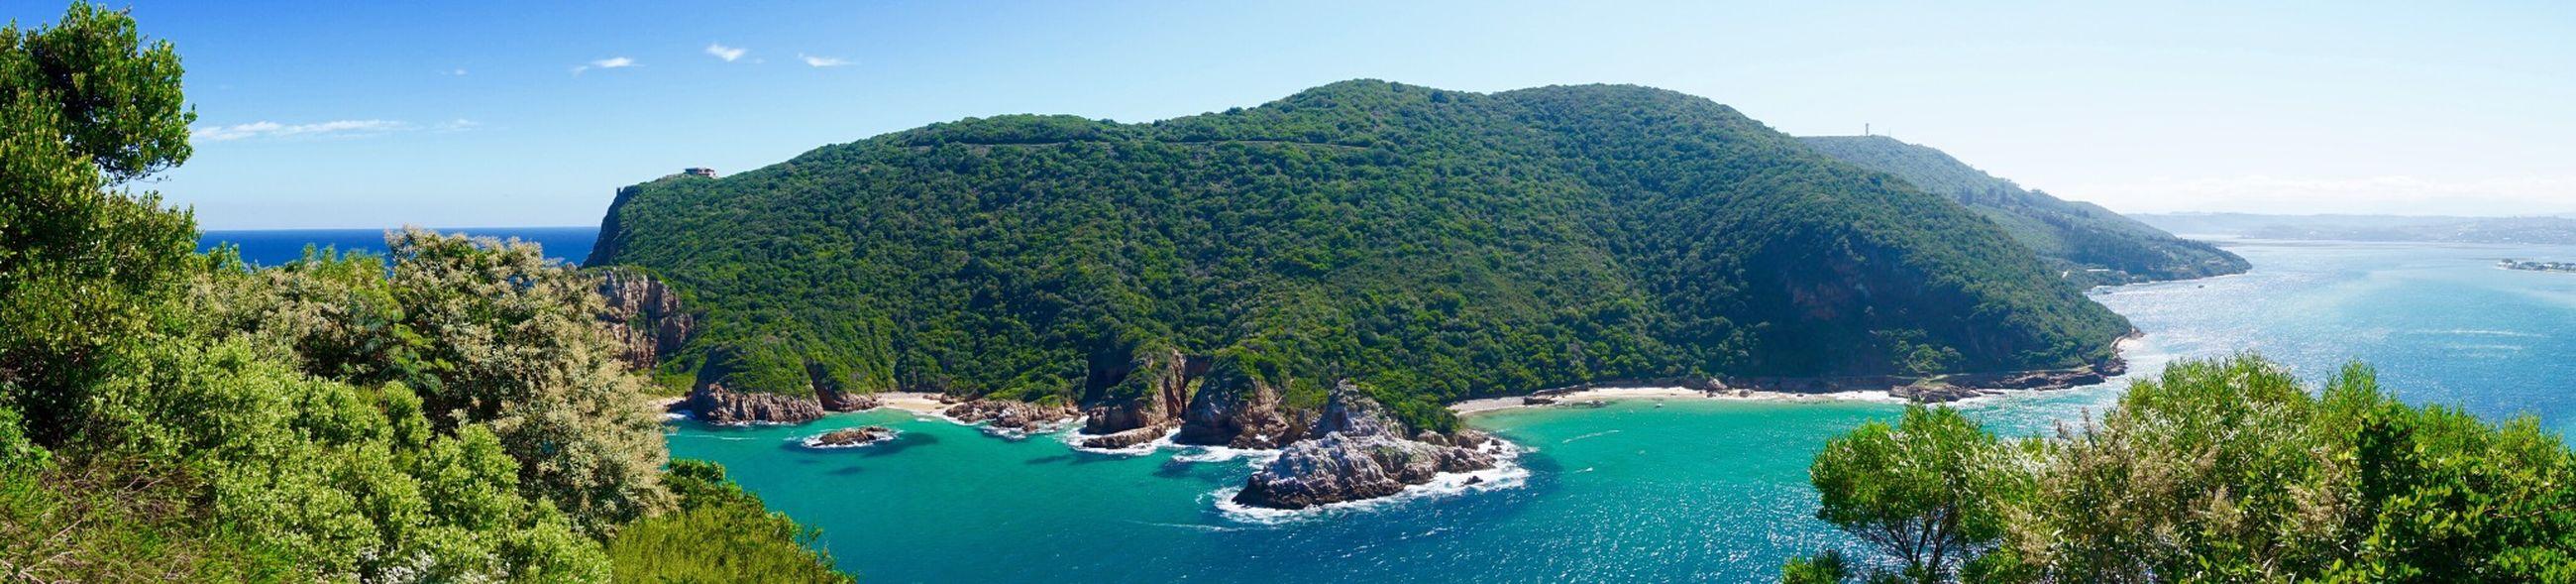 South Africa Landscape Ocean Coastline Awesome Nature Traveling